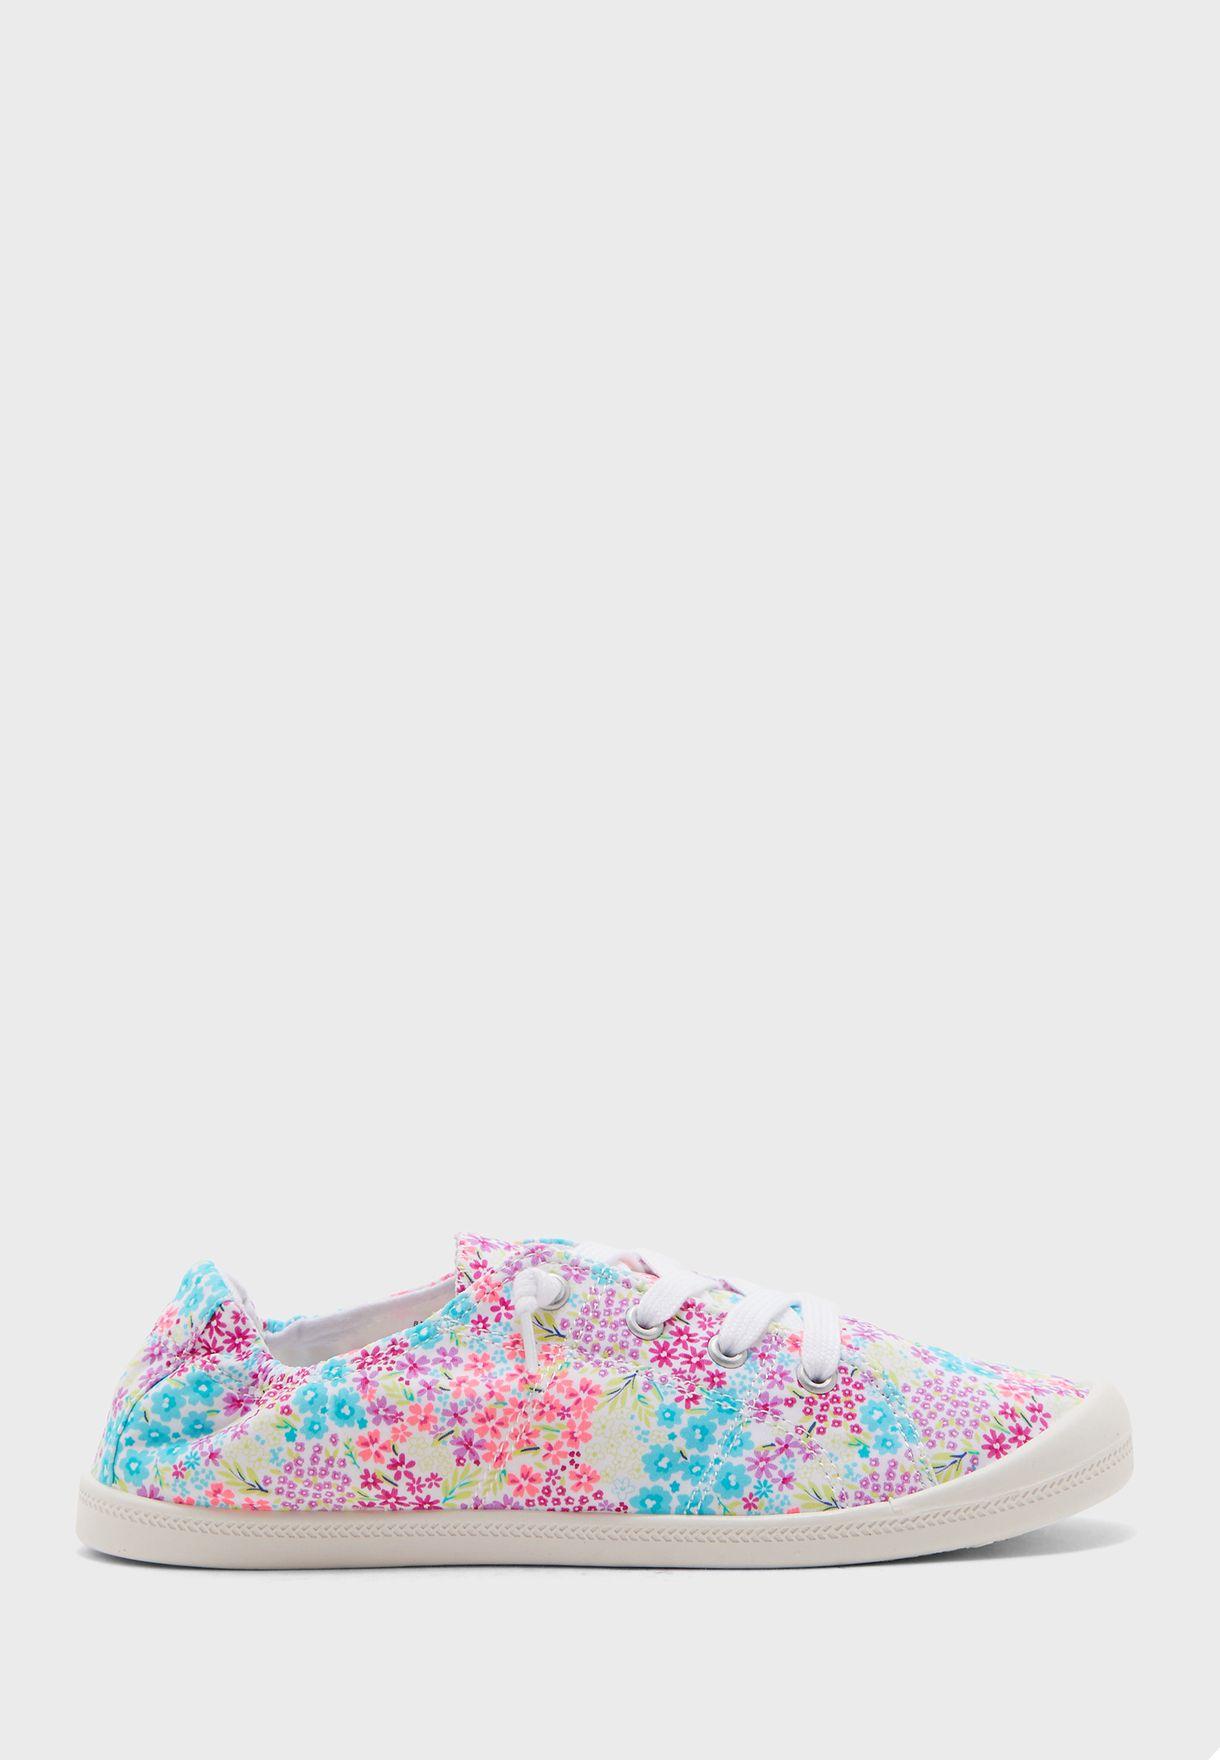 Steve Madden multicolor Baailey Sneaker